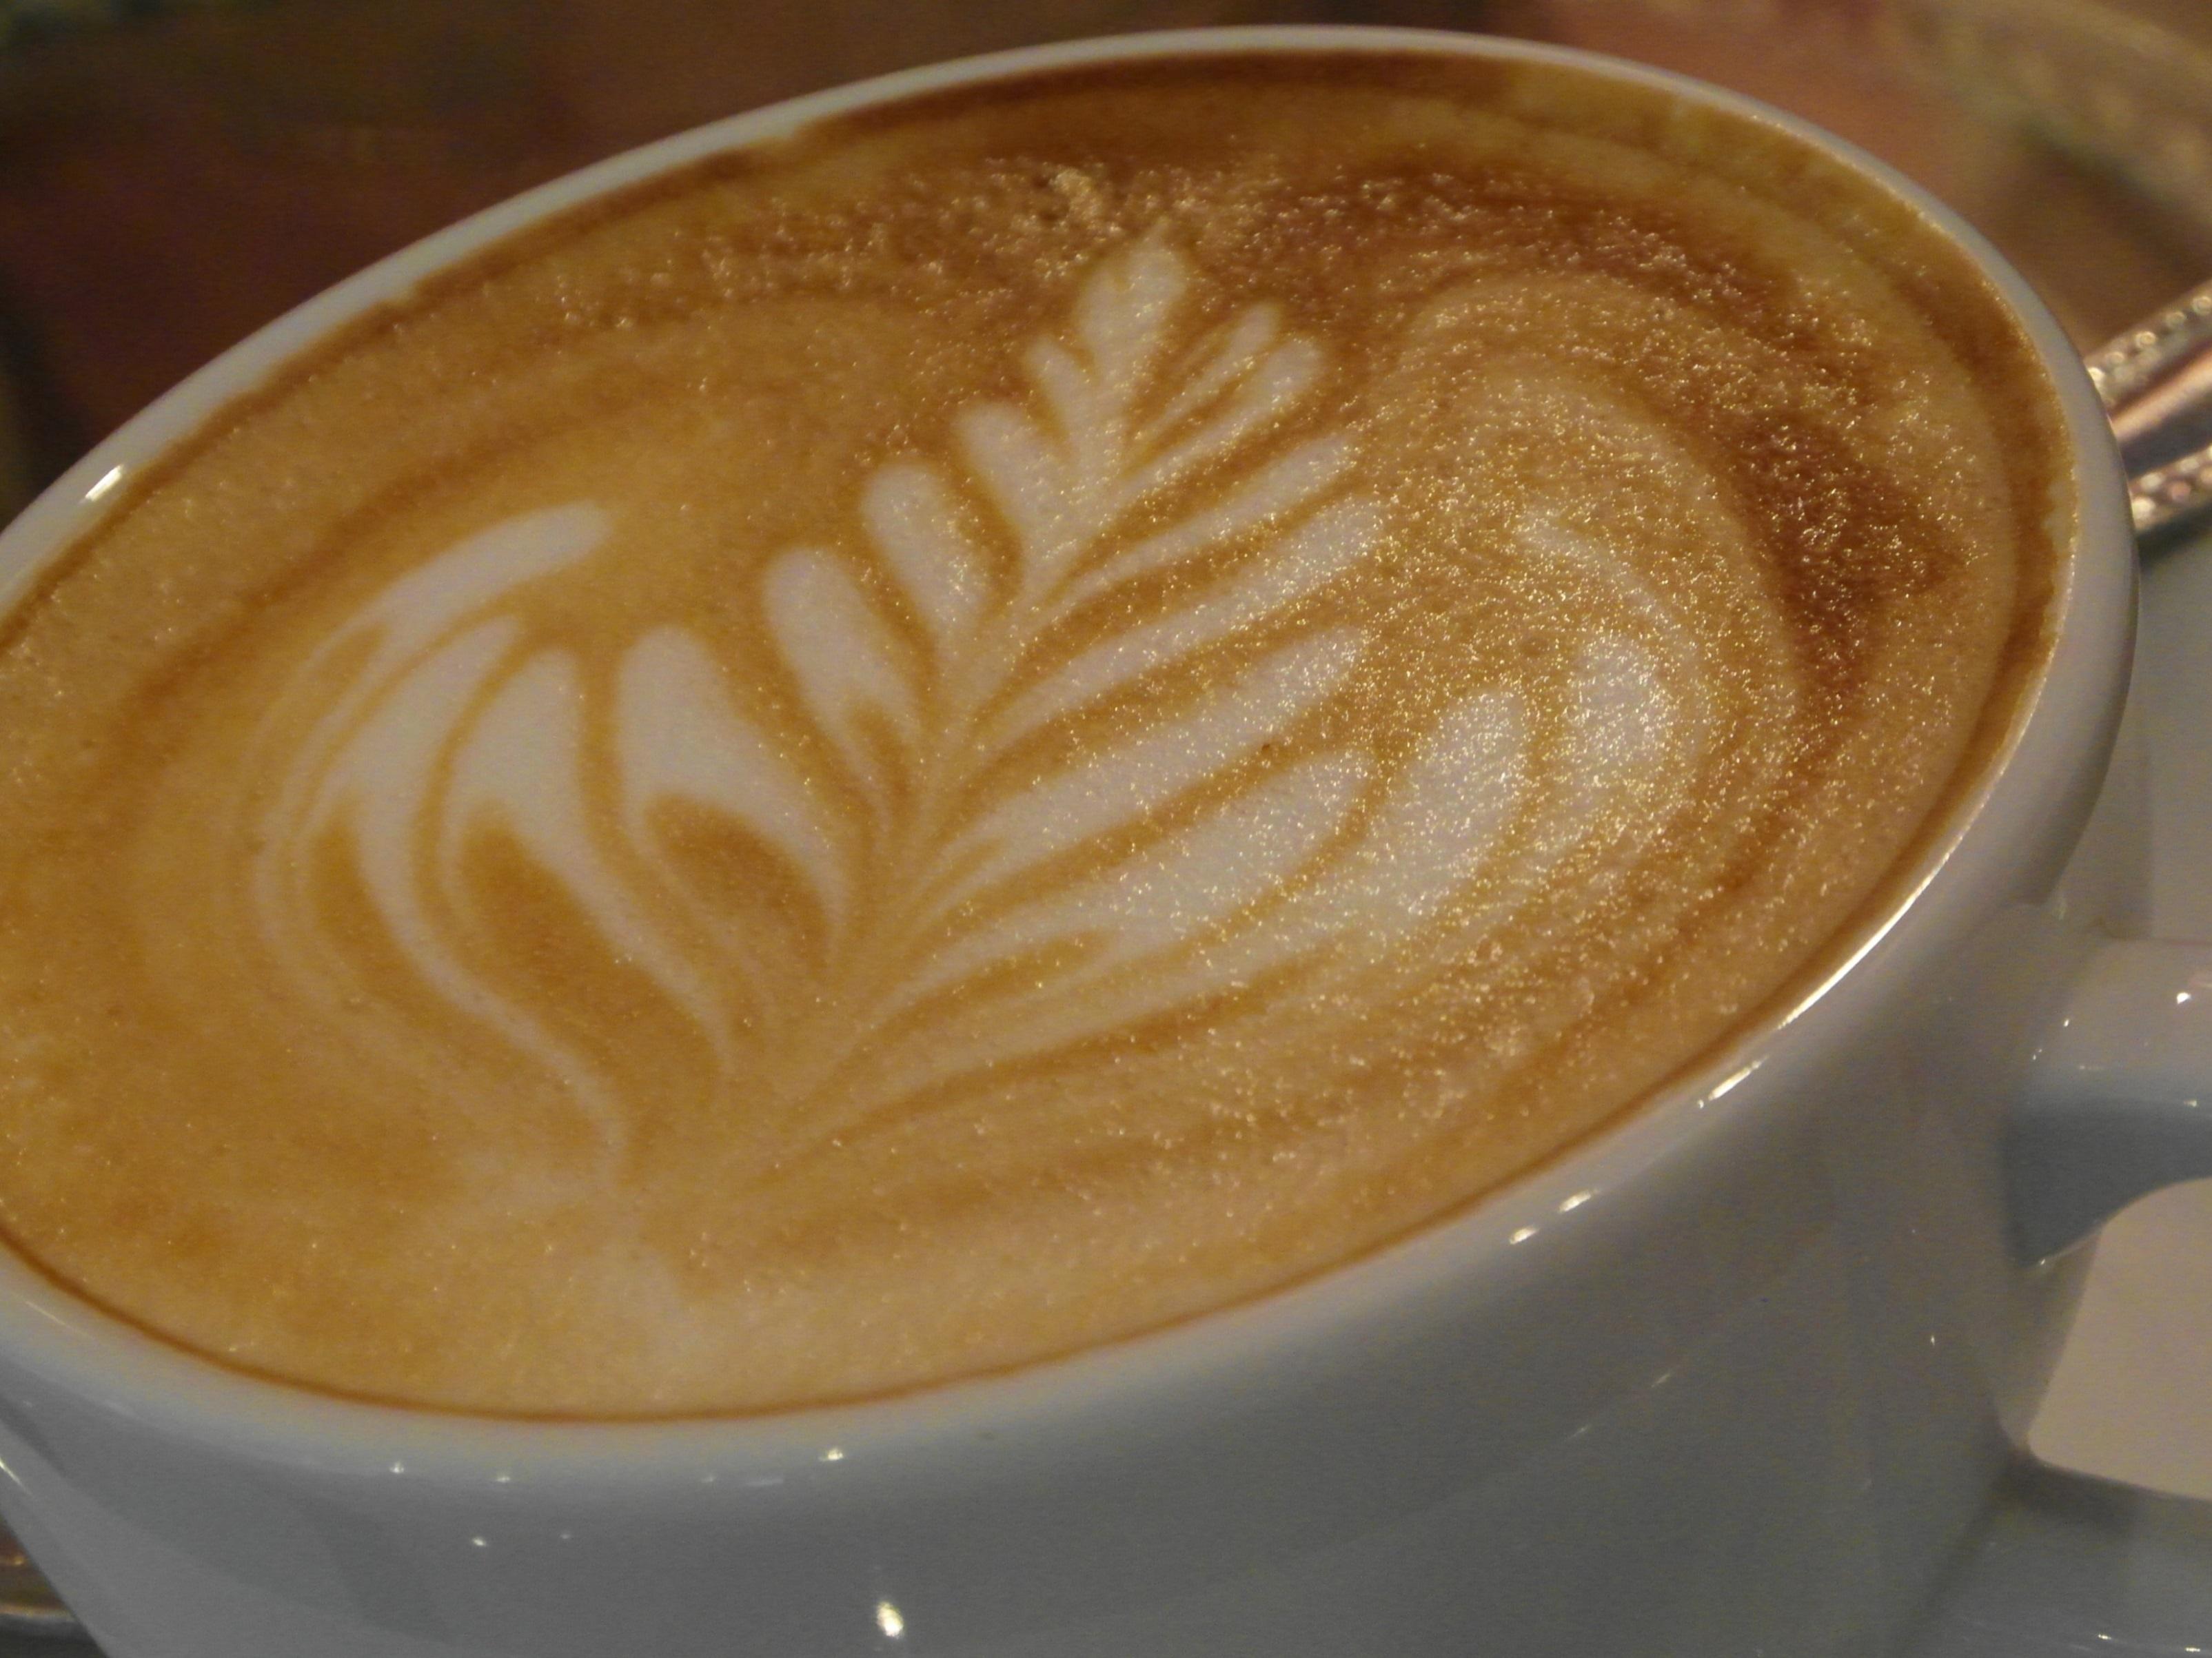 Coffee Art Patterns, Art, Latte, Espresso, Foam, HQ Photo